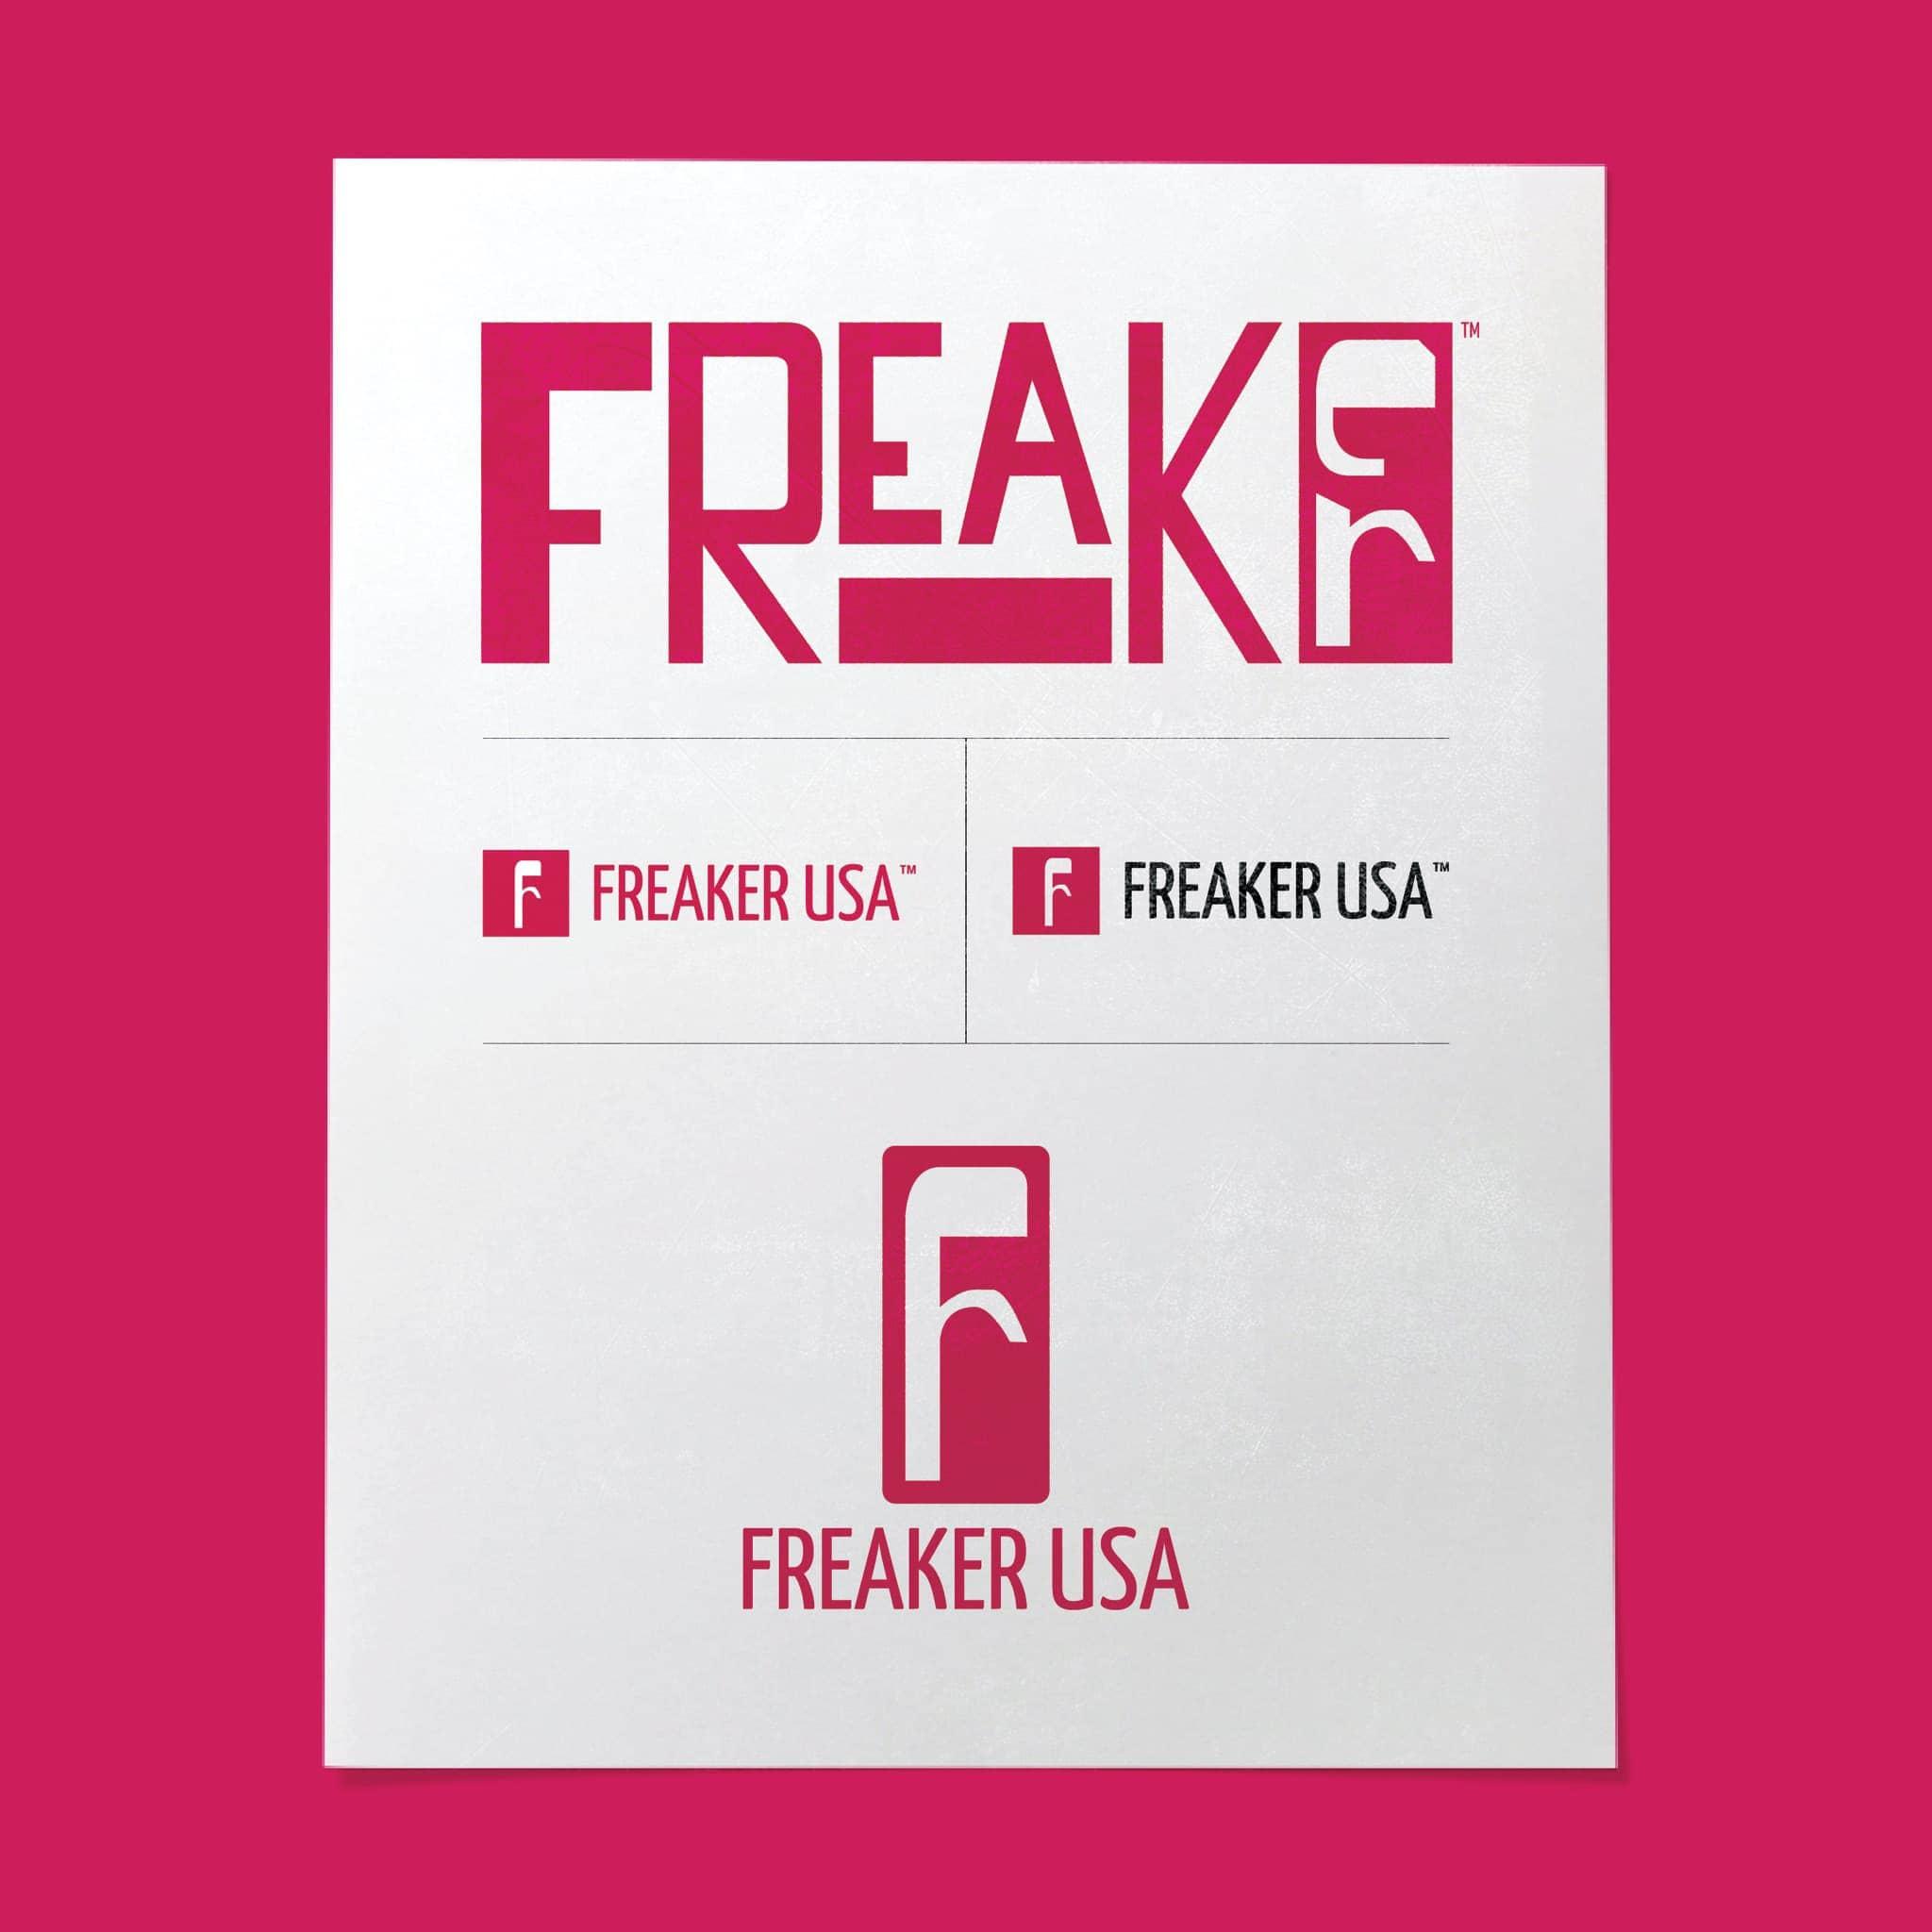 5b5803e86a8410a0f2bc1989_freaker-brand-logo-3-2-blank-web